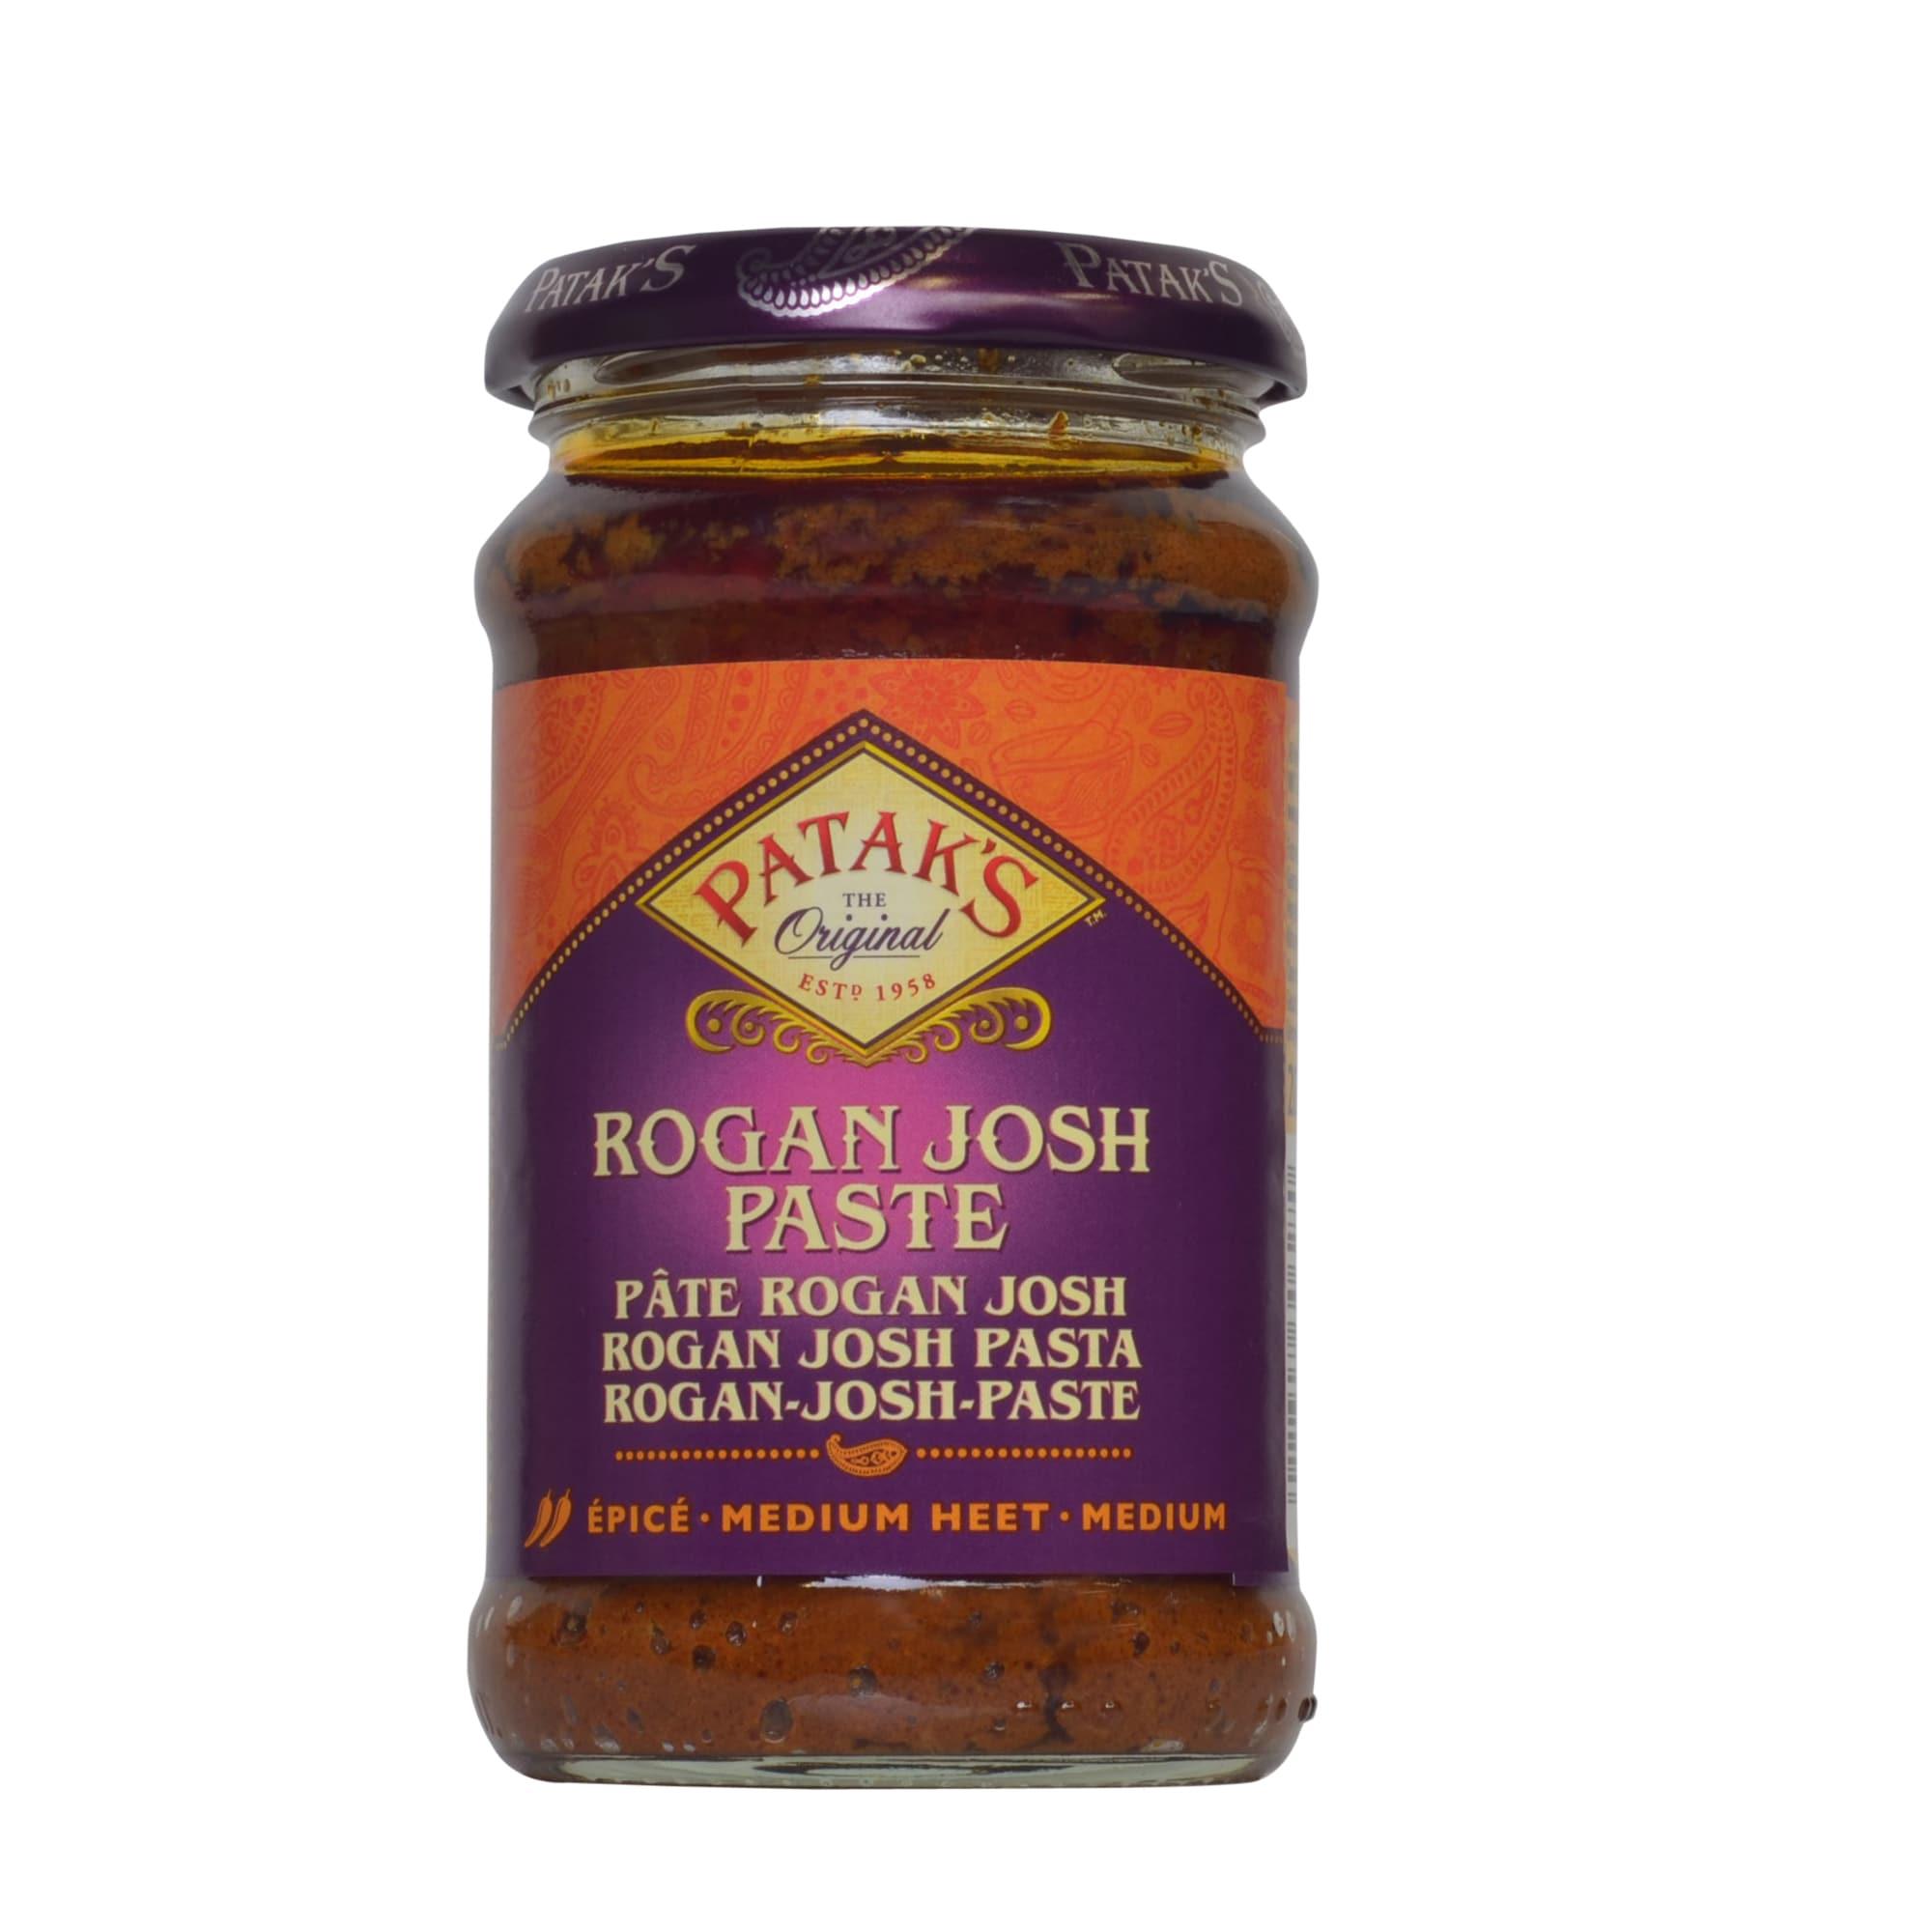 Patak's Rogan Josh Paste Currypaste mit Tomate und Paprika 283g